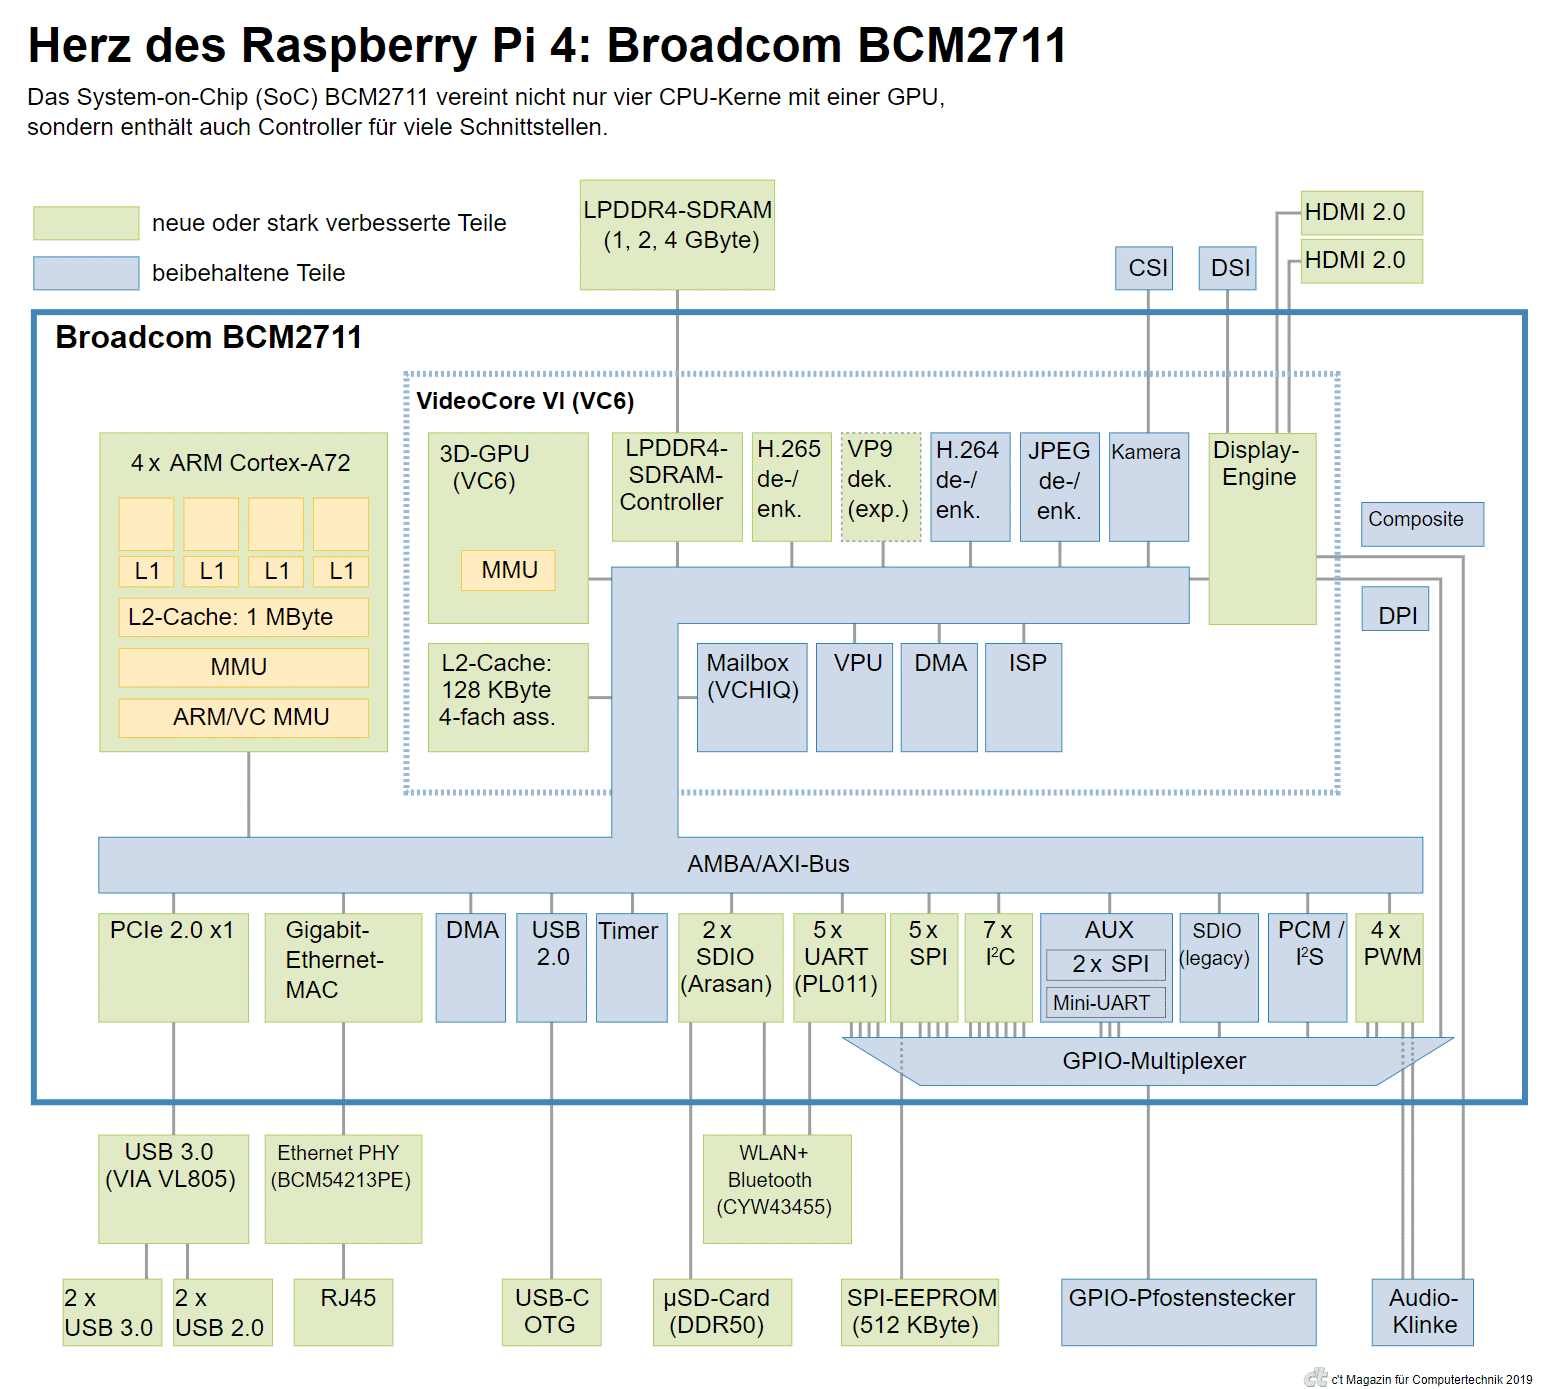 Blockschaltbild Raspberry Pi 4 mit Broadcom BCM2711